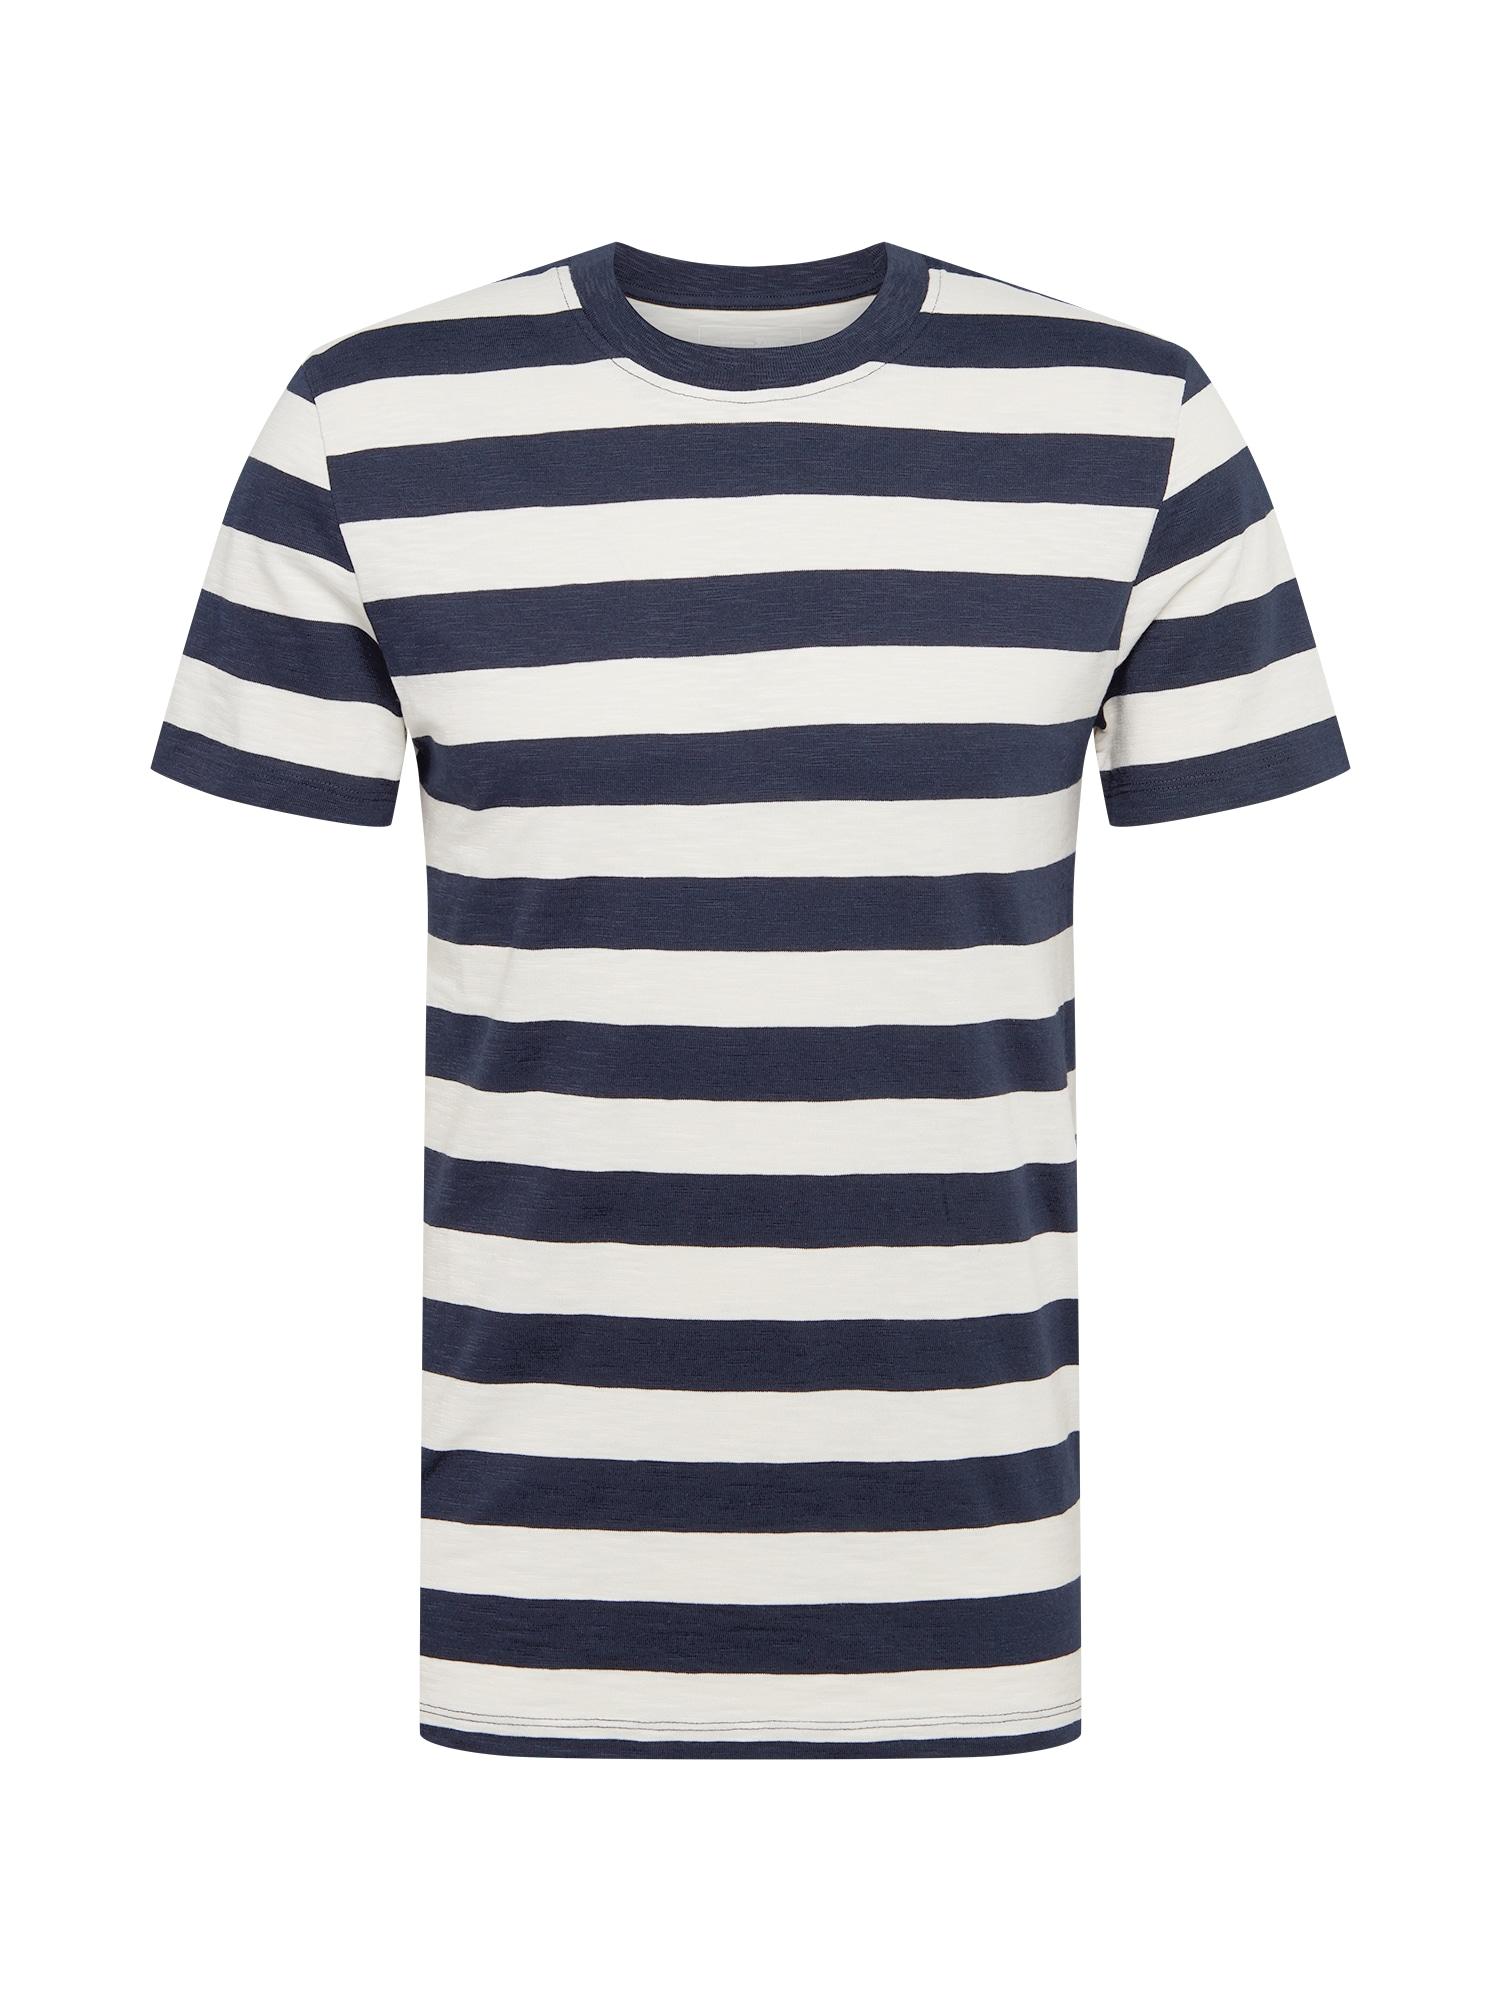 TOM TAILOR DENIM Tričko  modrá